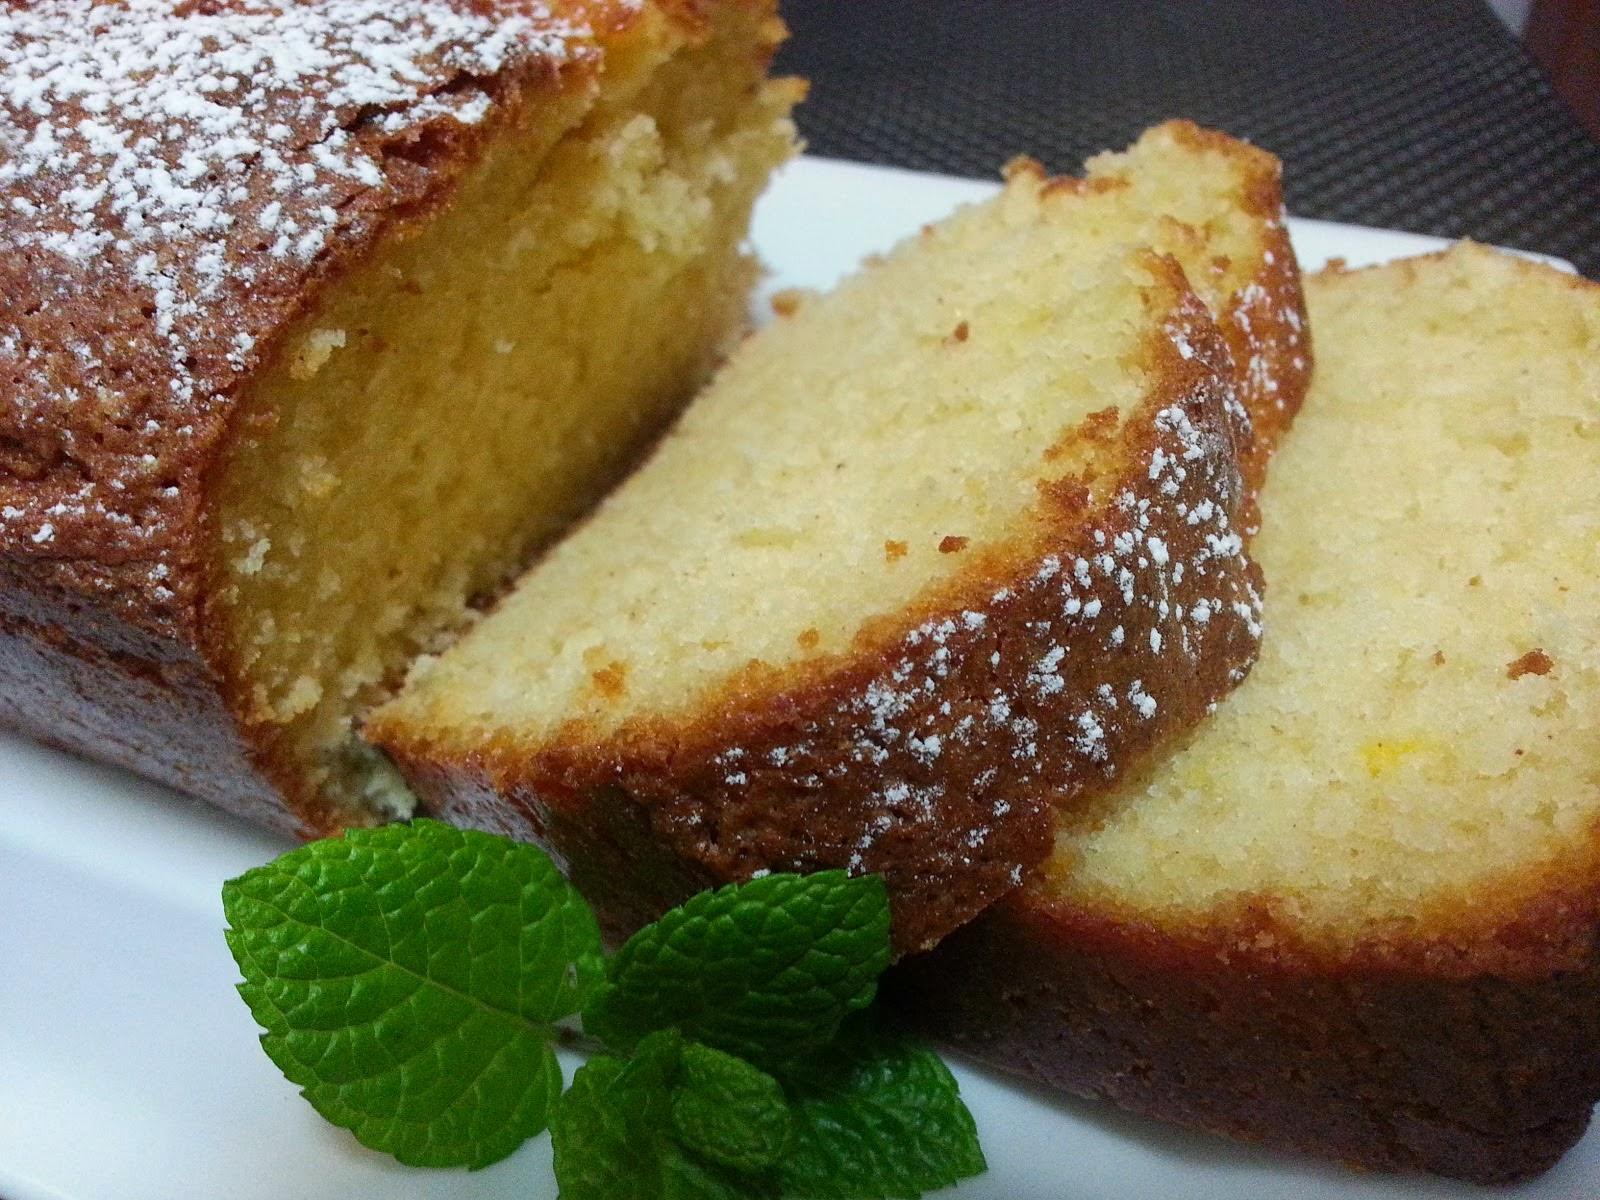 Cinco esponjosos bizcochos cocina for Recetas facilisimo